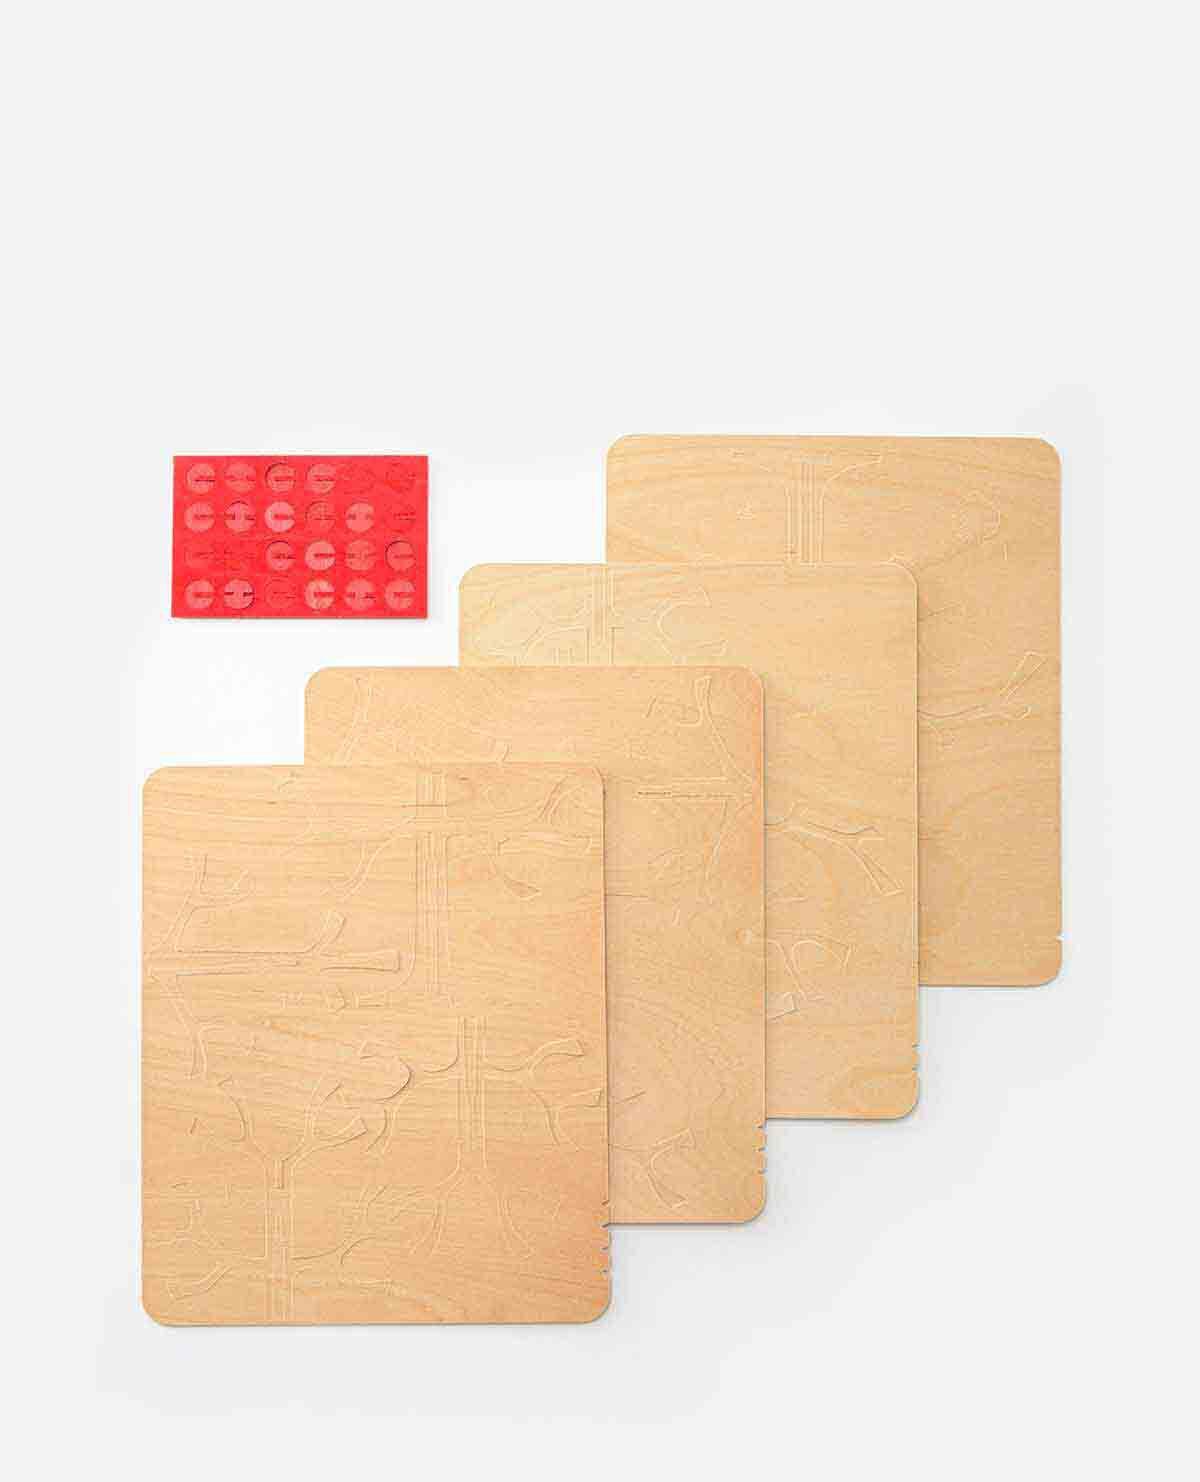 Momi-no-ki(モミの木)&ミニボール(レッド)セット 30cm